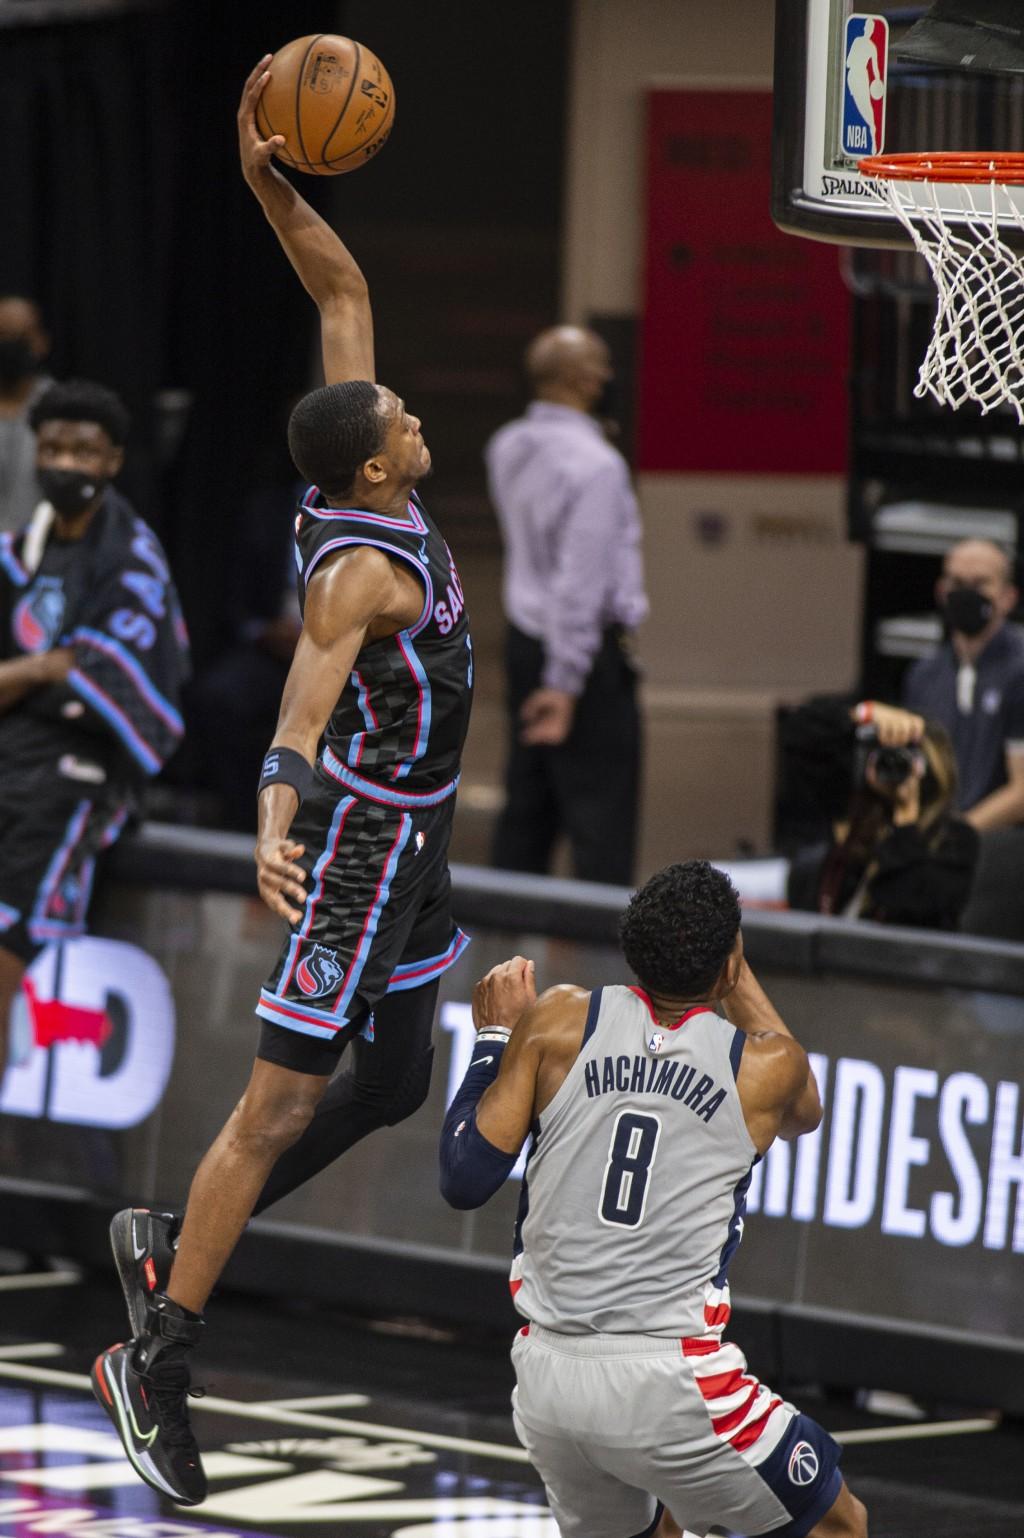 Sacramento Kings guard De'Aaron Fox (5) dunks in front of Washington Wizards forward Rui Hachimura (8) during the second quarter of an NBA basketball ...